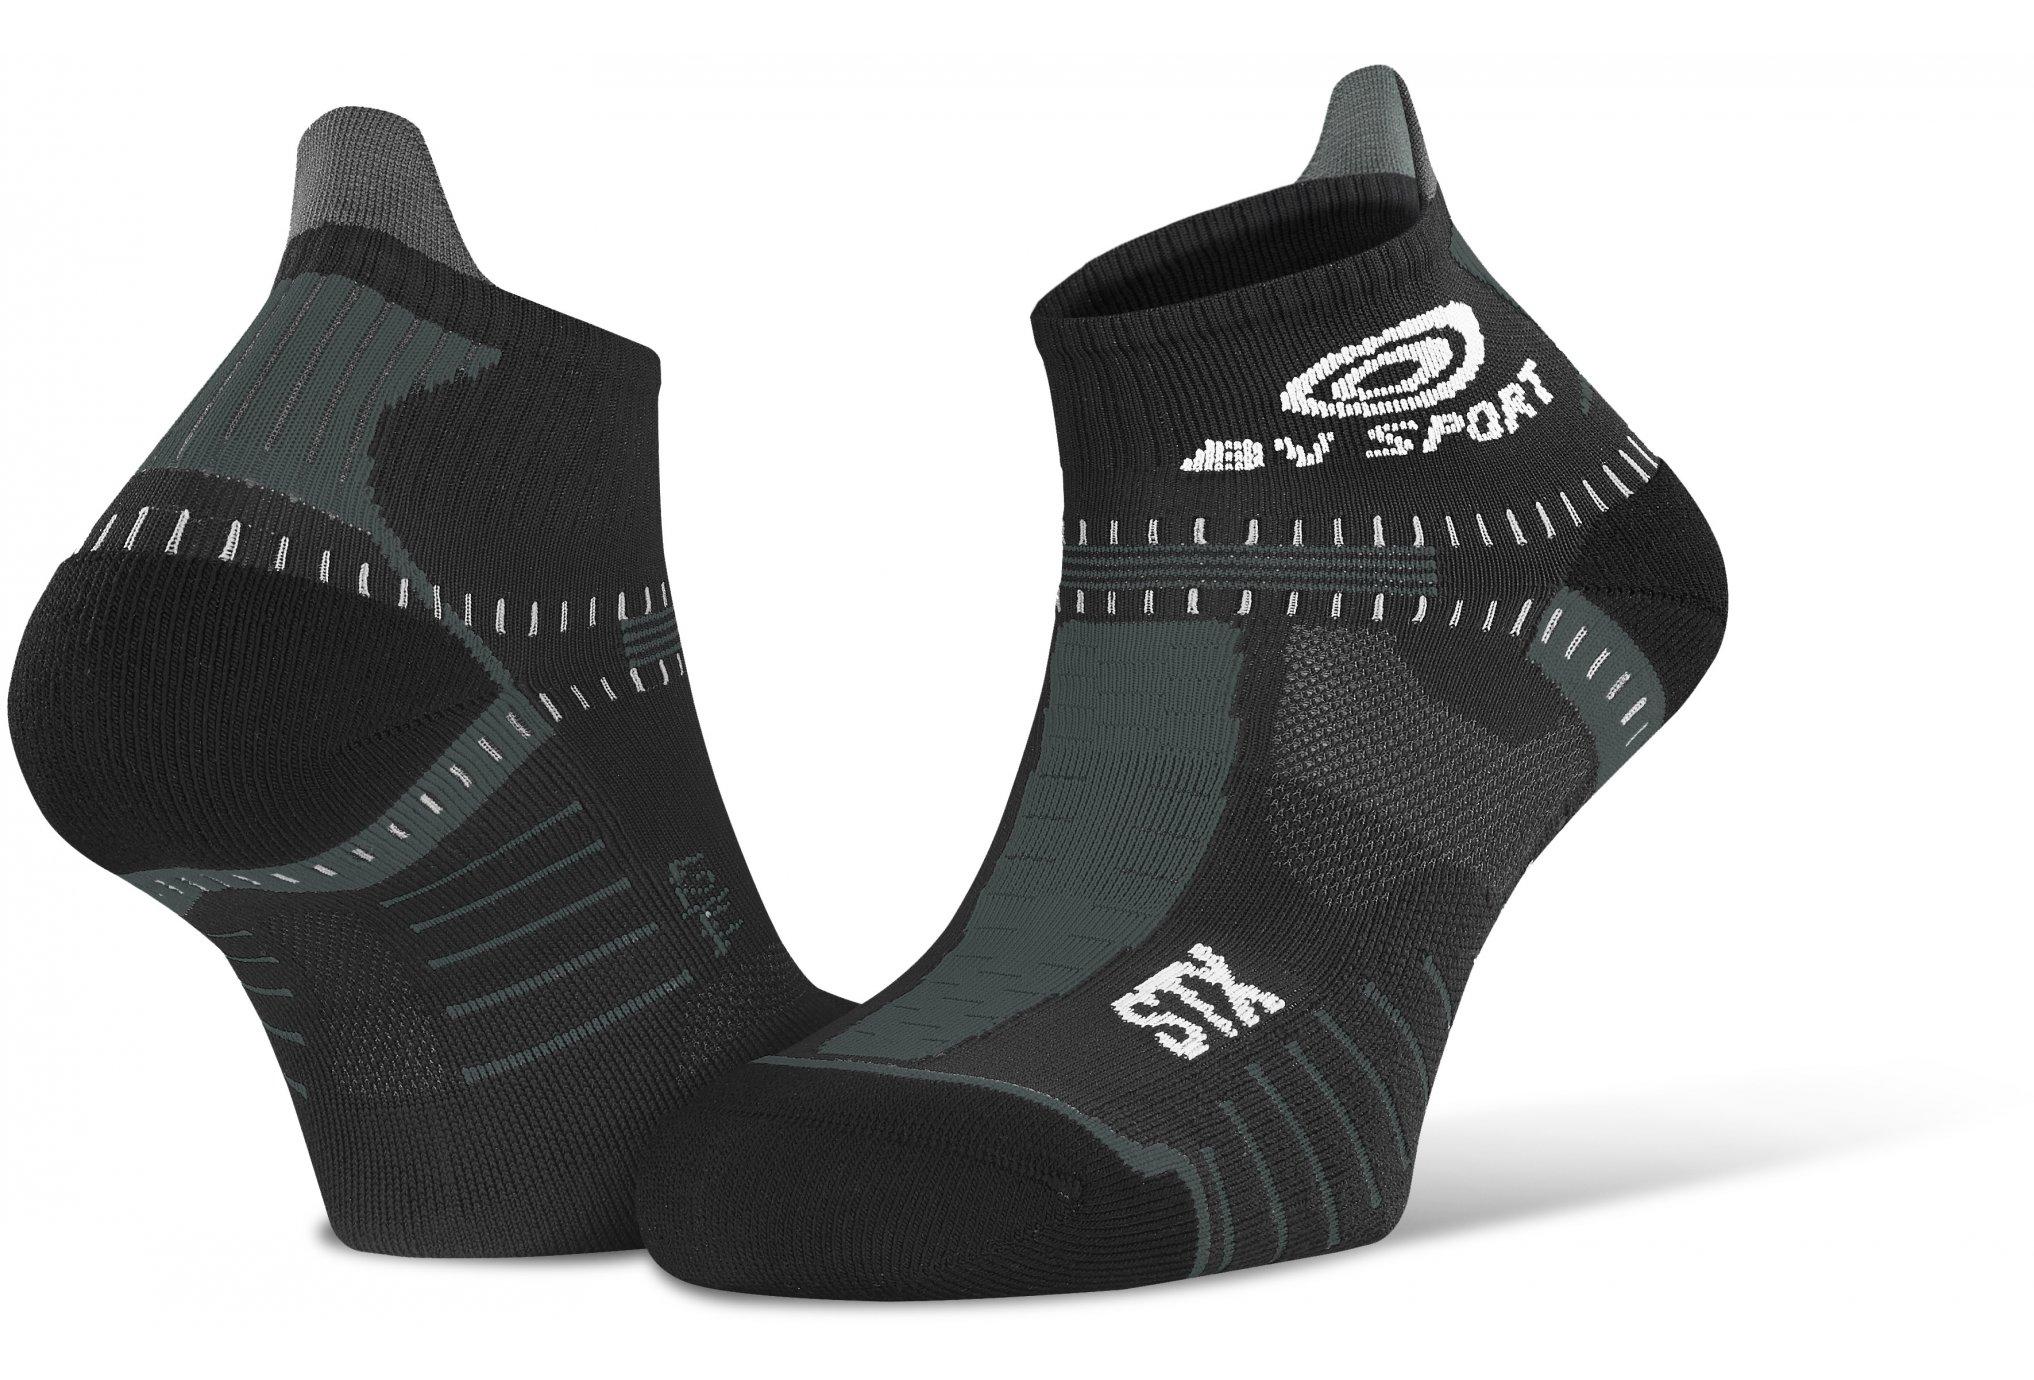 BV Sport STX Evo Chaussettes